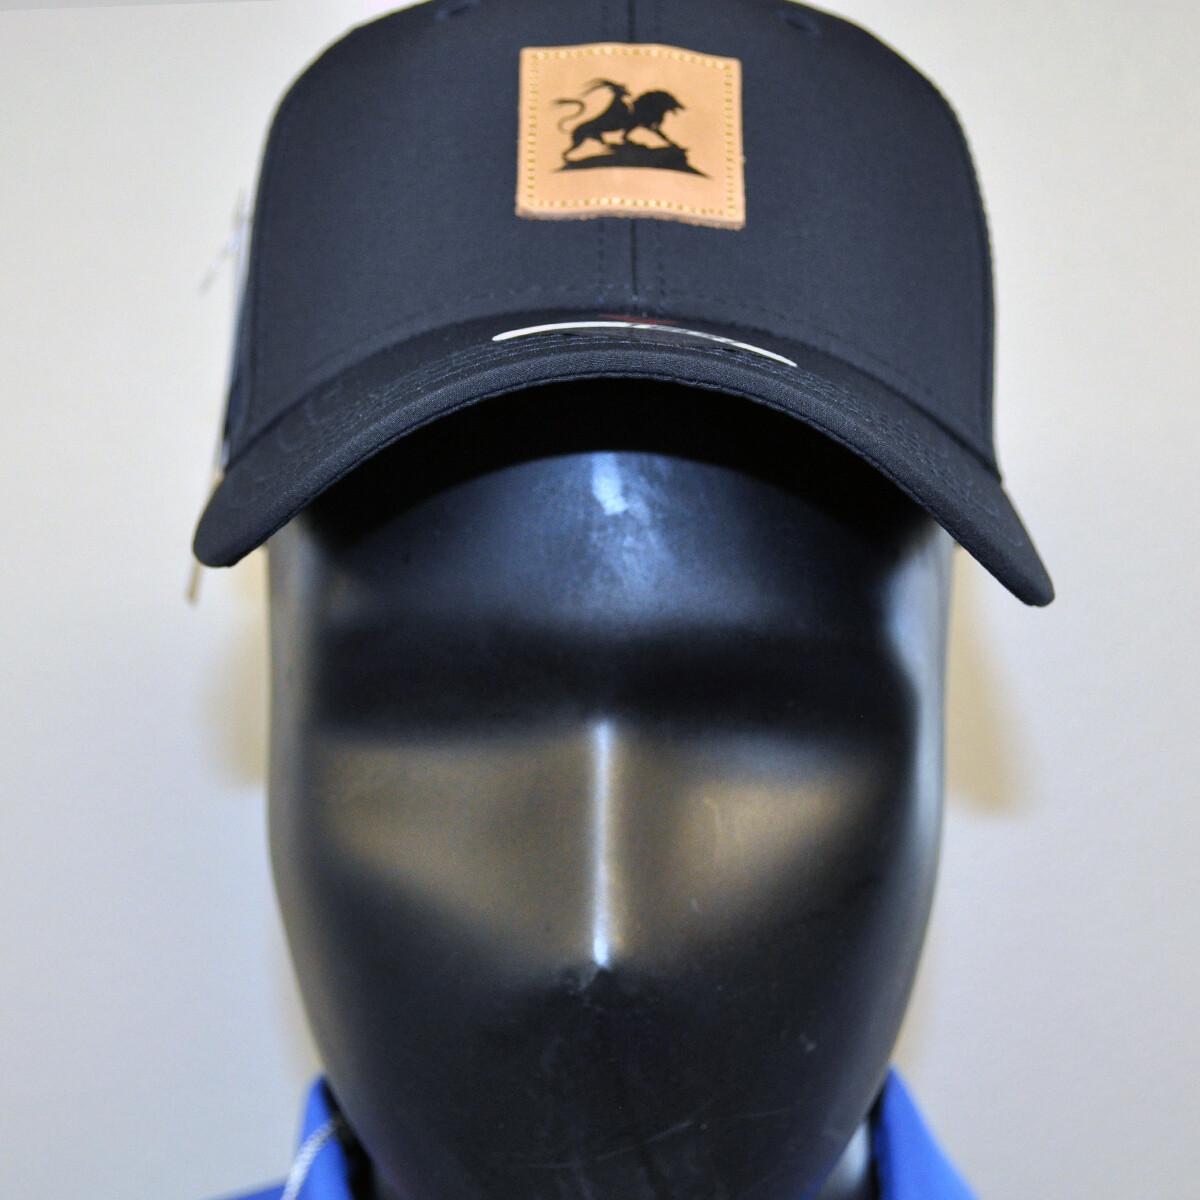 Men's Golf Hat - OSFA Black/Leather Patch